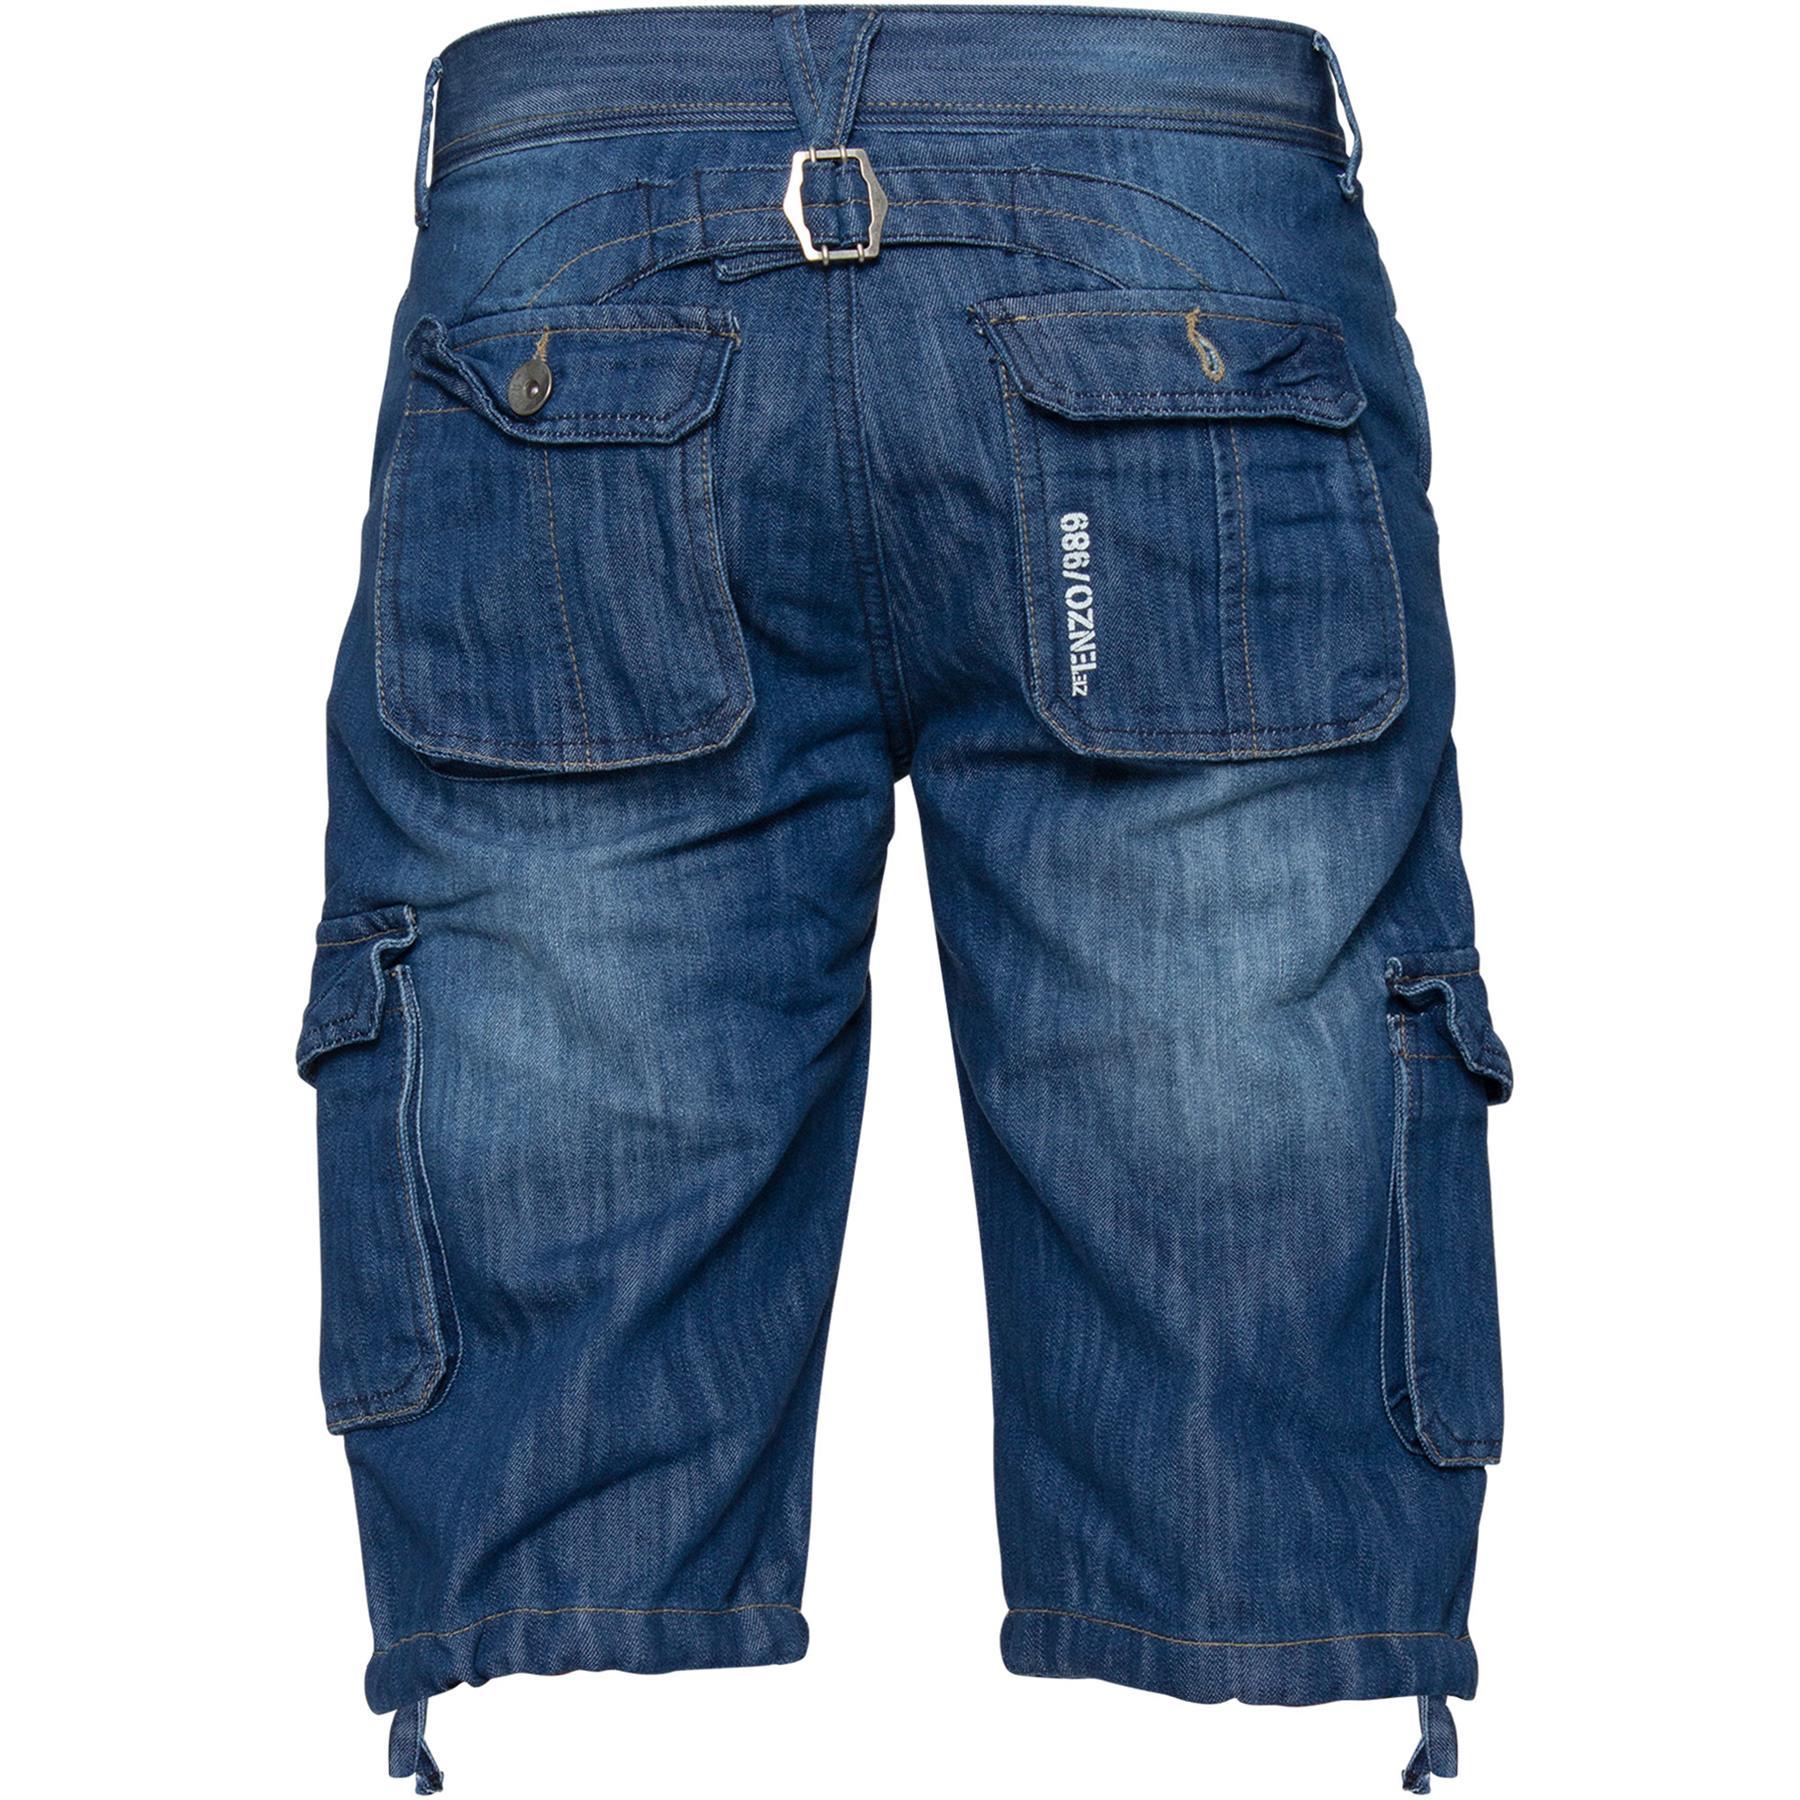 ENZO-Jeans-para-hombre-de-carga-combate-informal-de-verano-Shorts-Pantalones-Cortos-de-Jeans-Todas miniatura 6